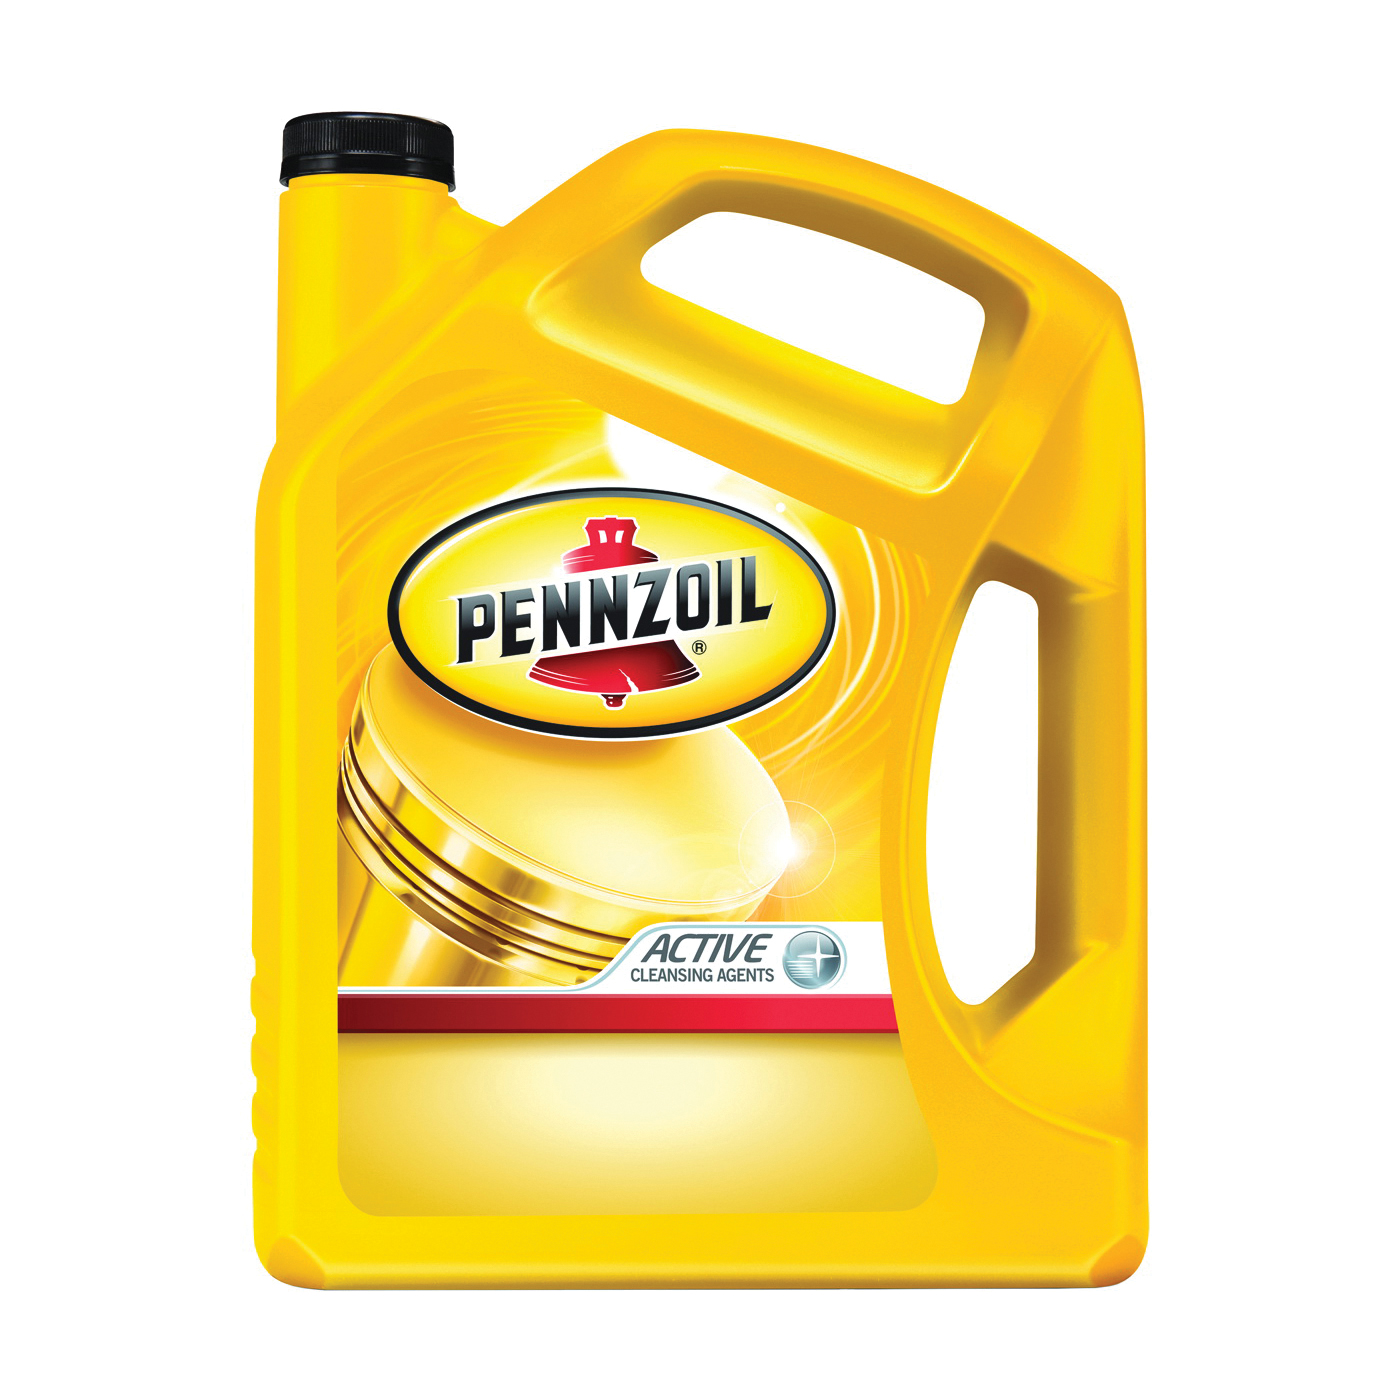 Picture of Pennzoil 550045214 Motor Oil, 10W-30, 5 qt Package, Bottle